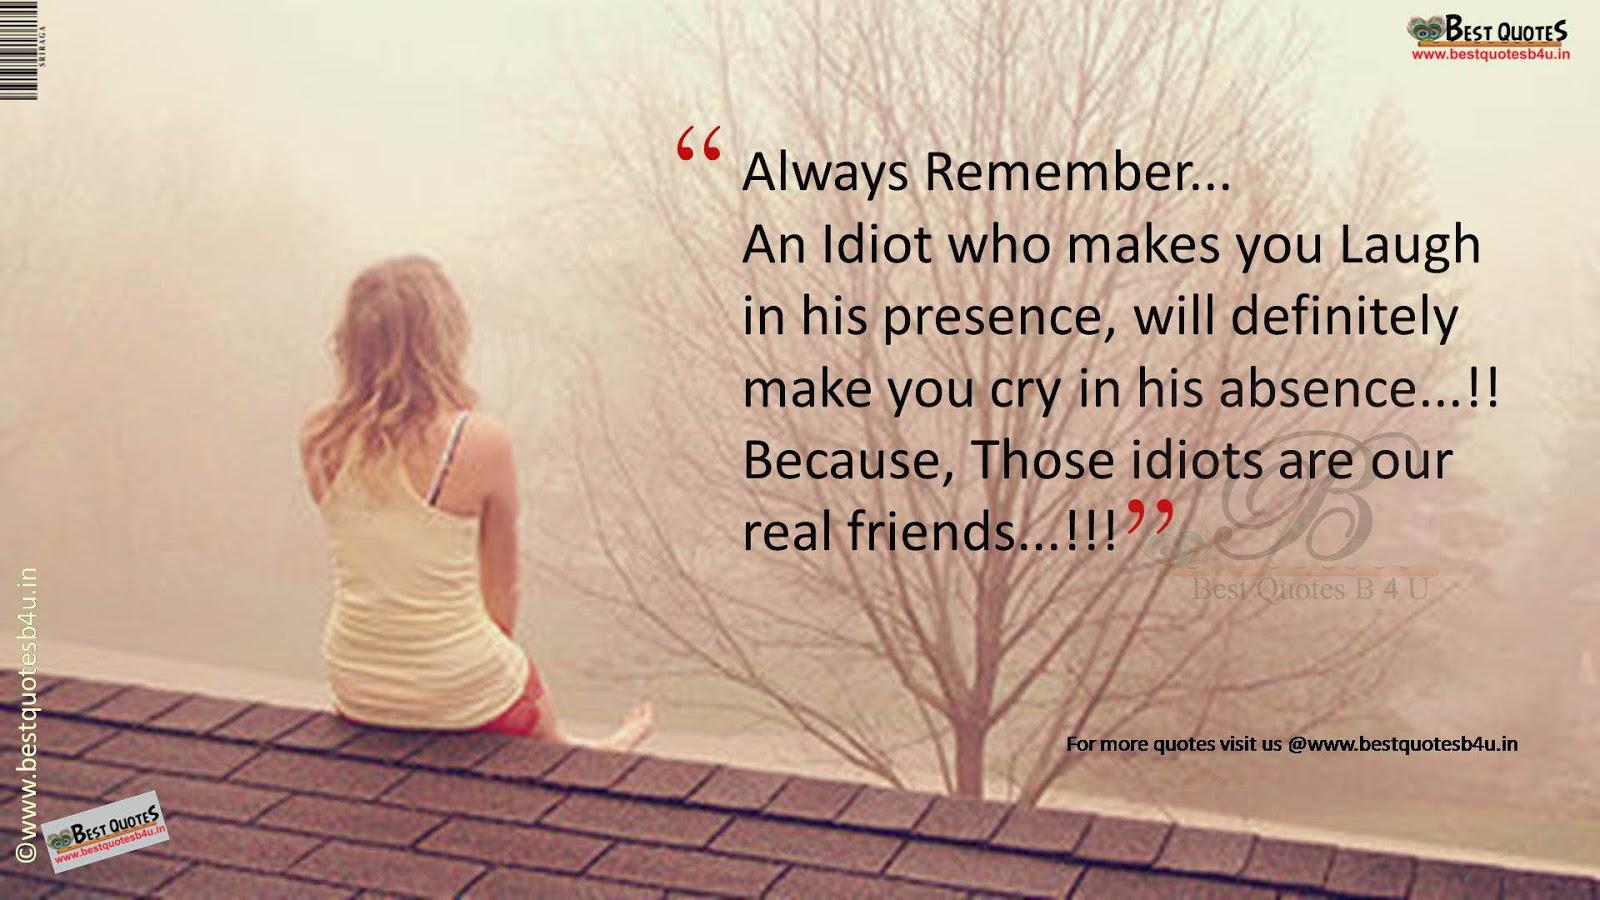 Image of: Best Friend Friendship Day Heart Touching Quotes In Hindi Friendship Day Quotes 2017 Heart Touching Quotes In Hindi On Friendship Day 2016 Friendship